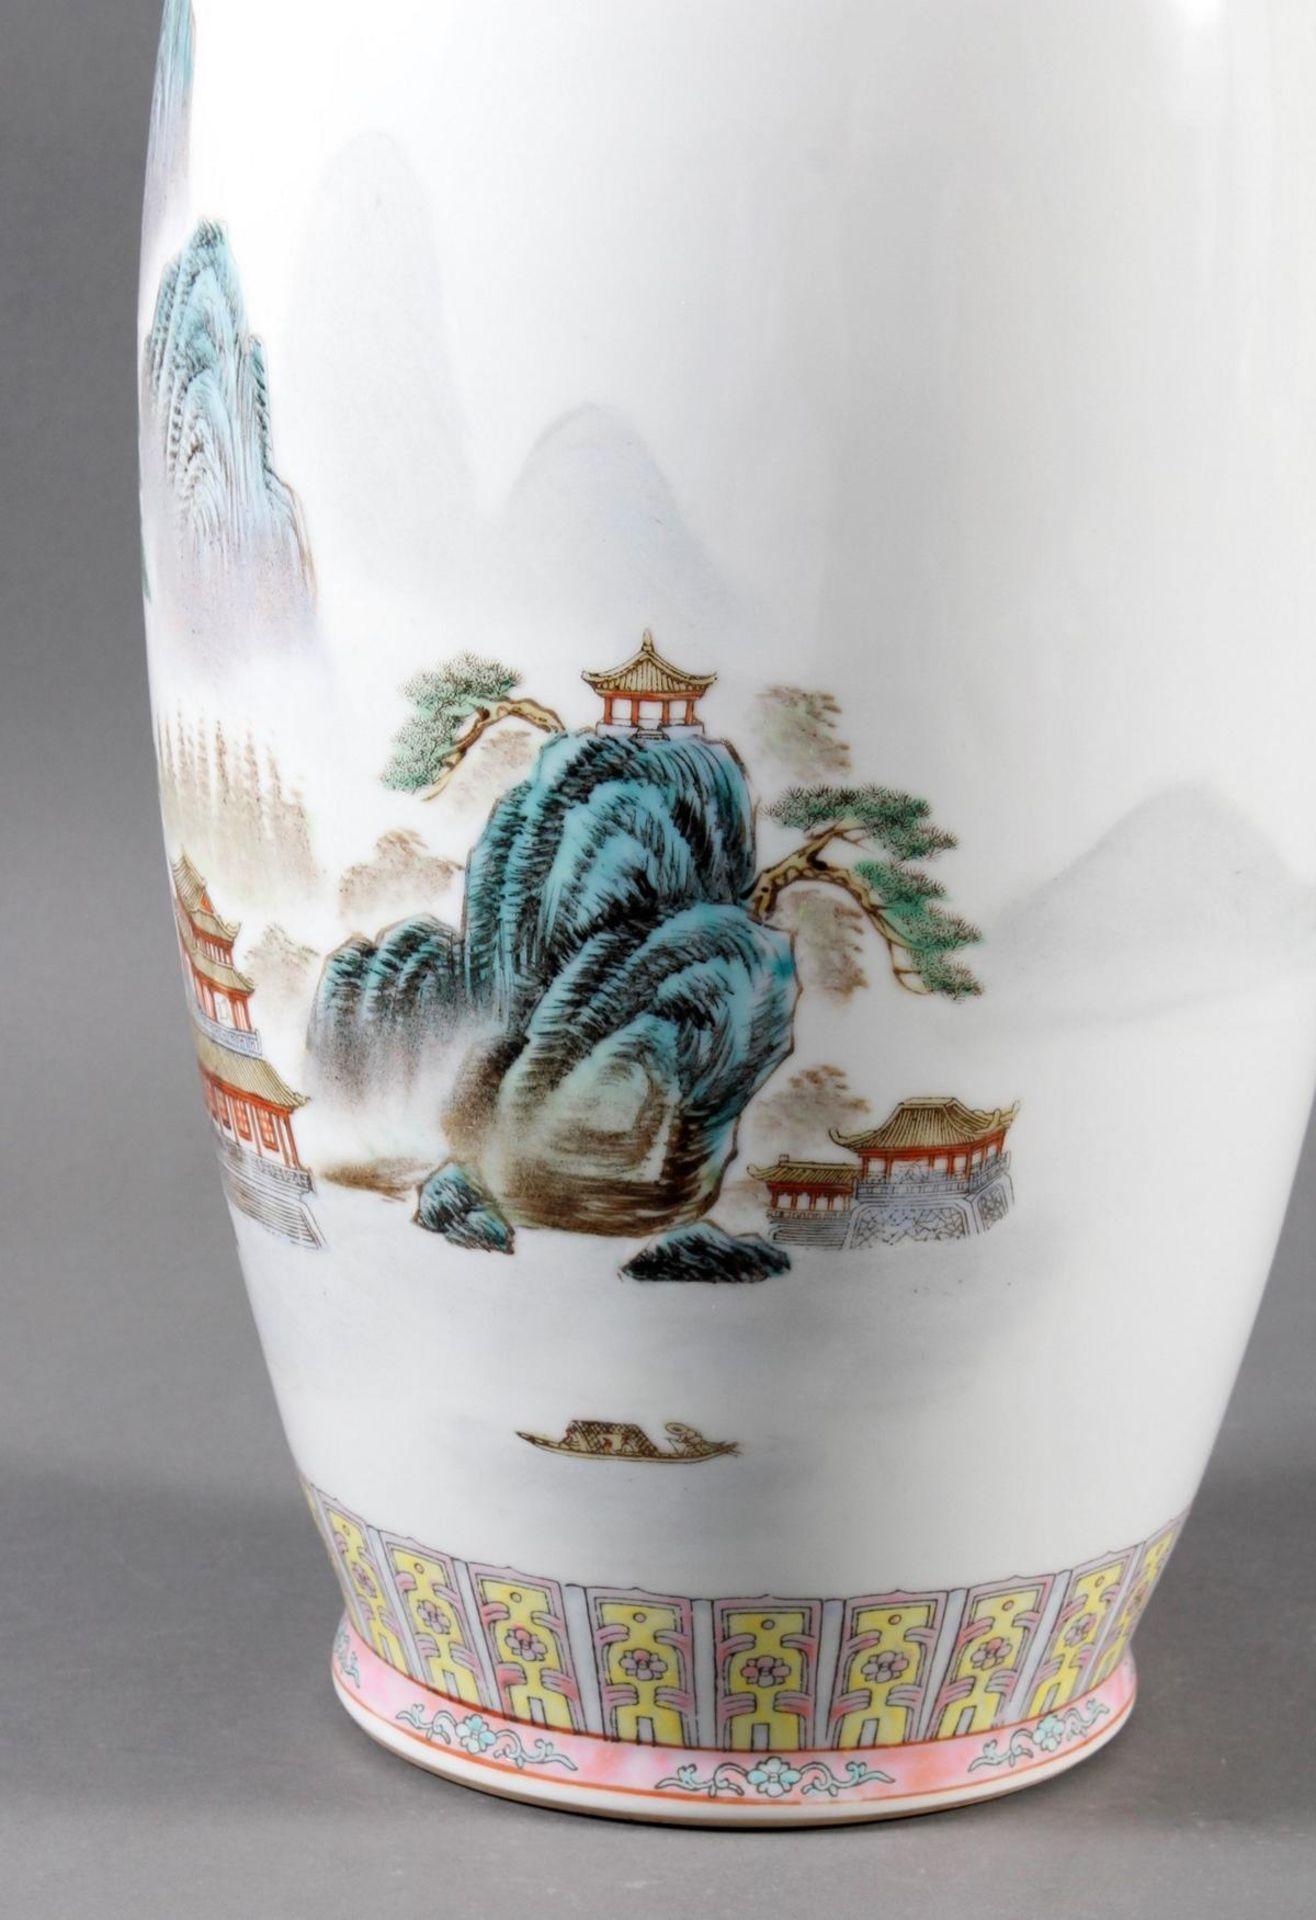 Porzellan Bodenvase, China 20. Jahrhundert - Bild 7 aus 12